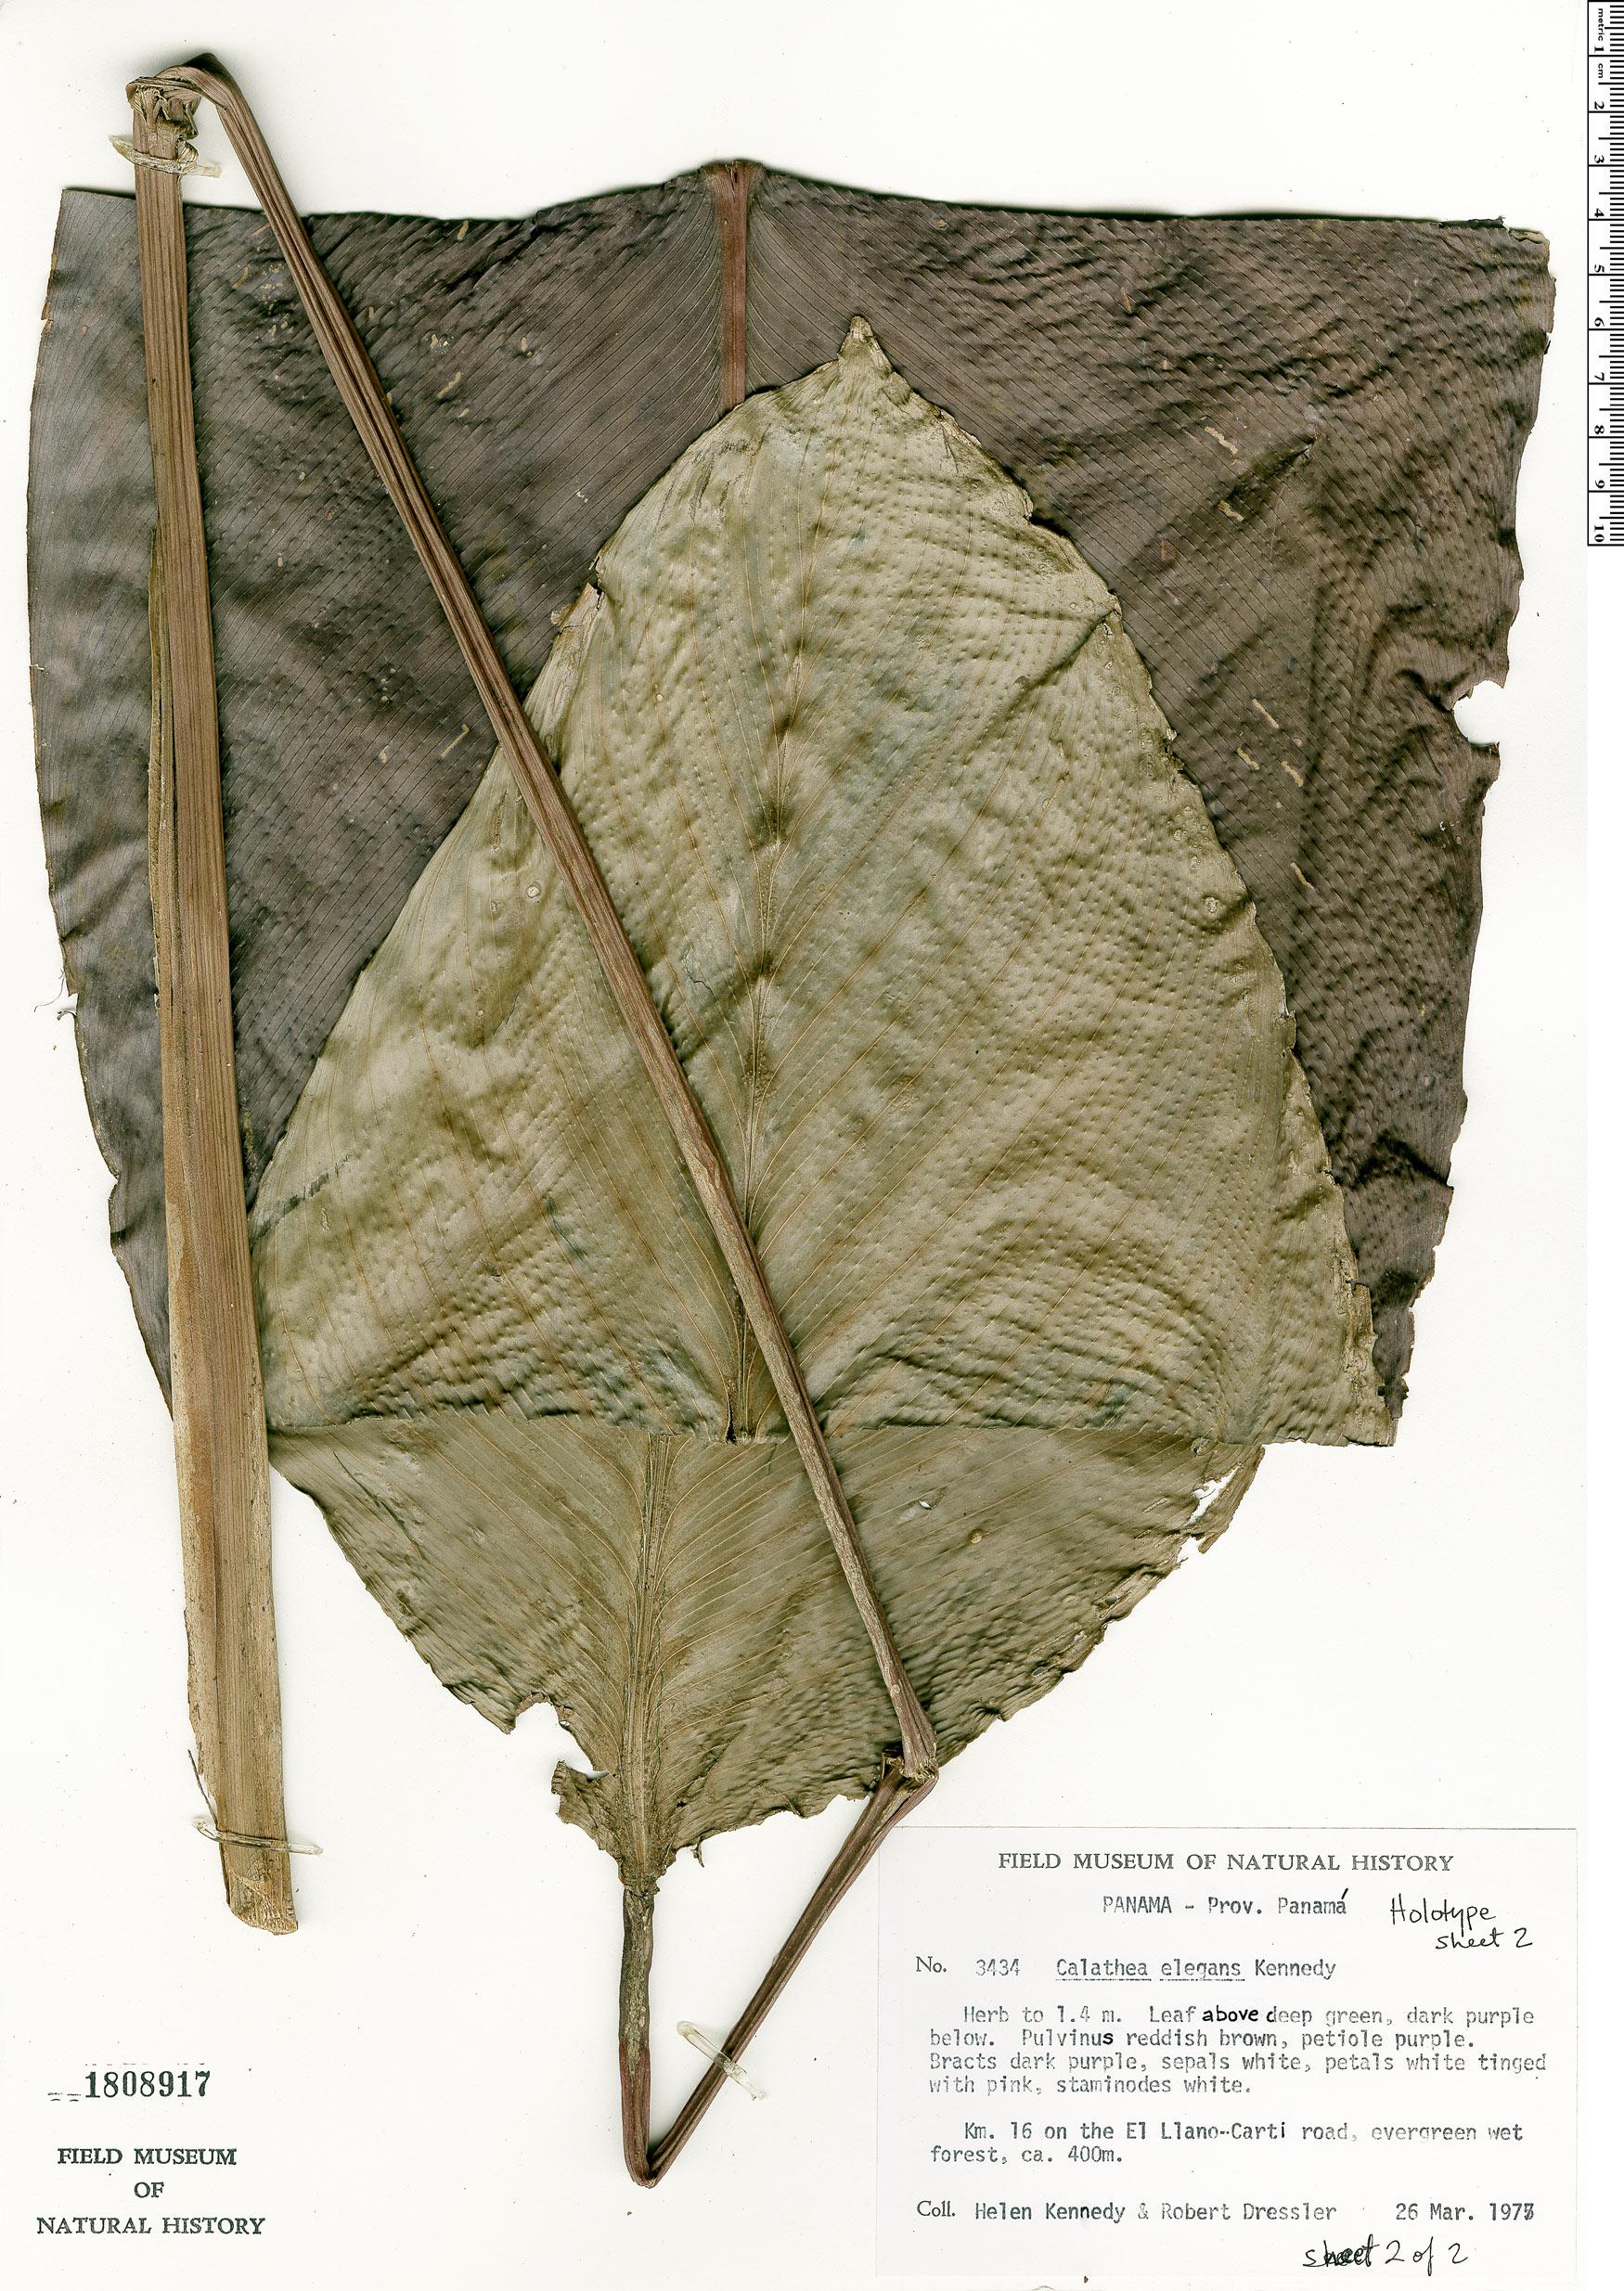 Espécime: Calathea elegans